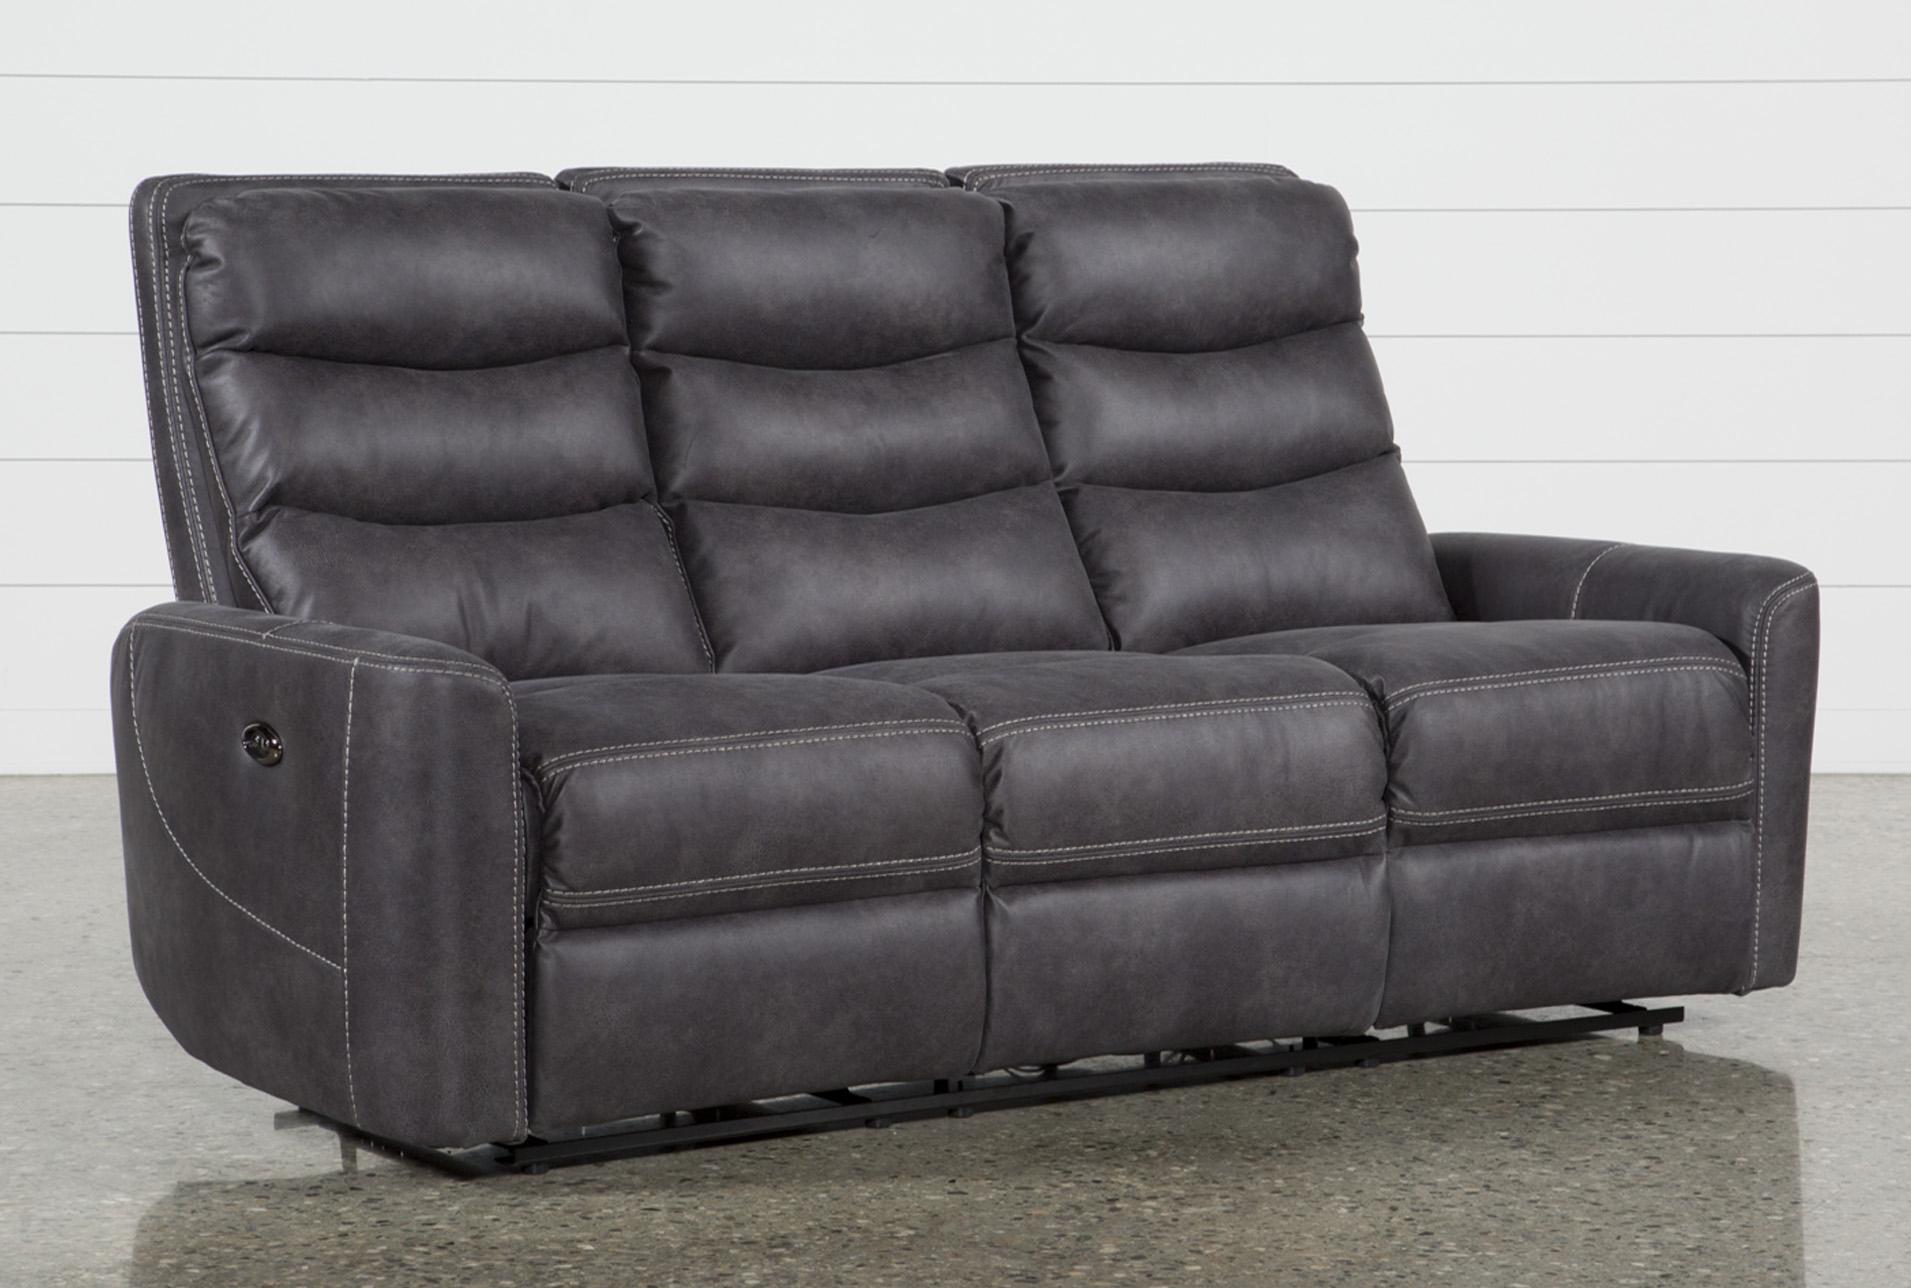 malia power reclining sofa living spaces rh livingspaces com power sofa recliner mechanism sofa power recliner houston